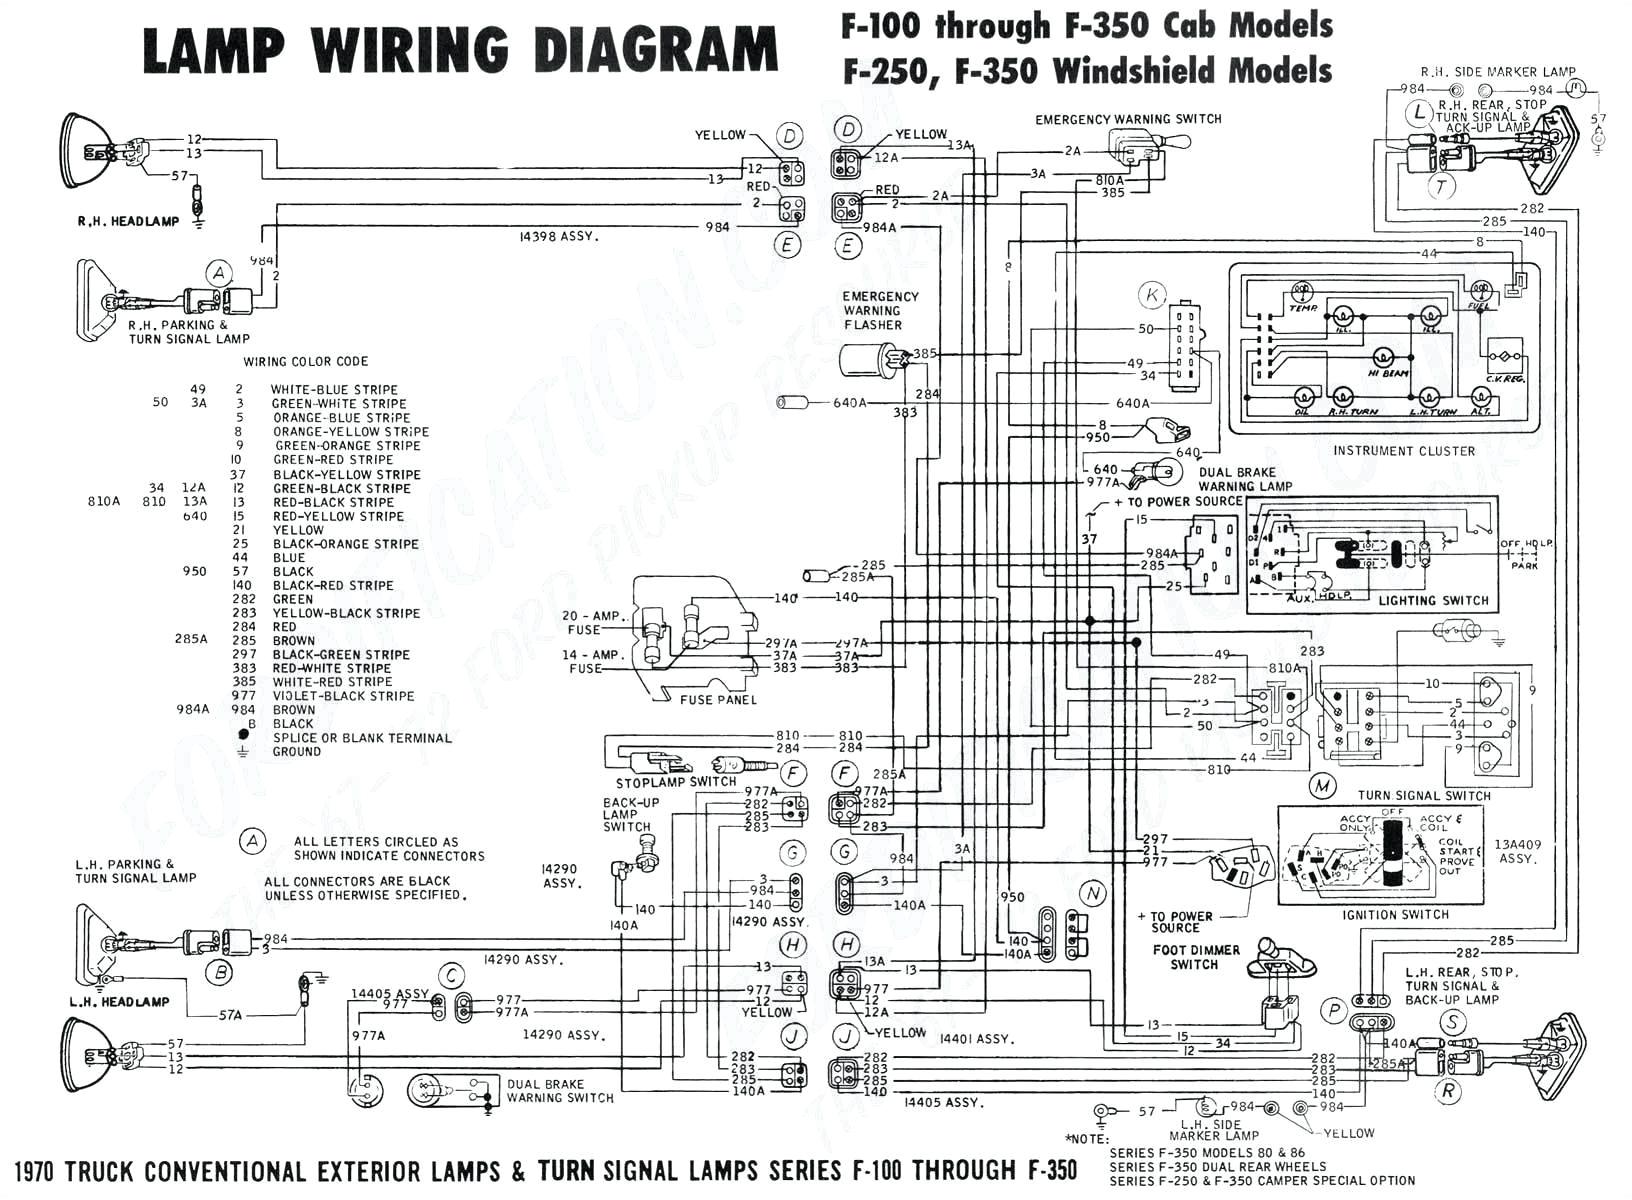 2003 chevy truck wiring diagram wiring diagram database drawing program in addition 2003 chevy silverado radio wiring diagram